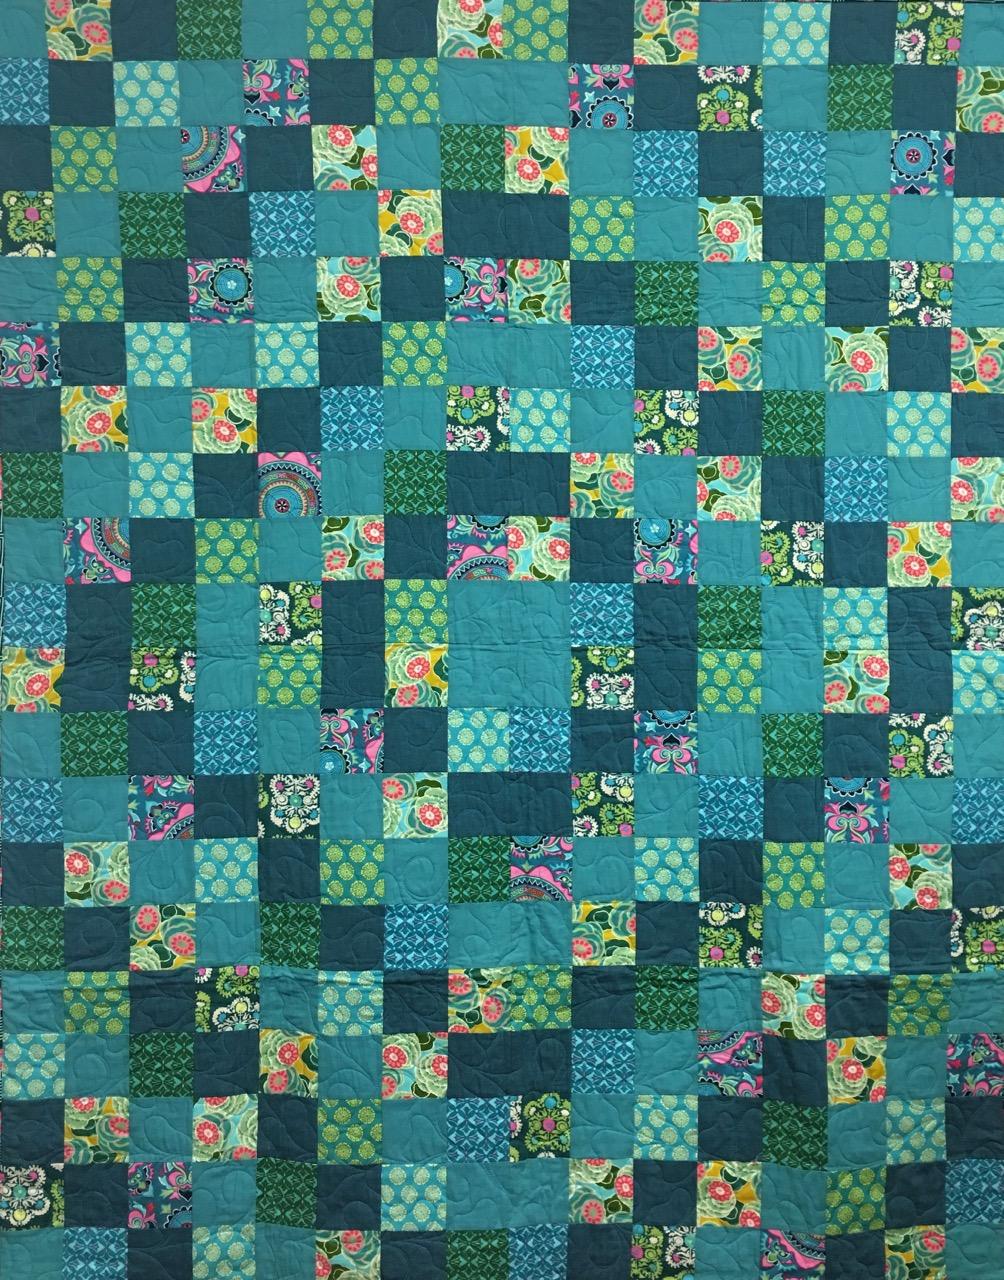 0527 antique dream weaver.jpg